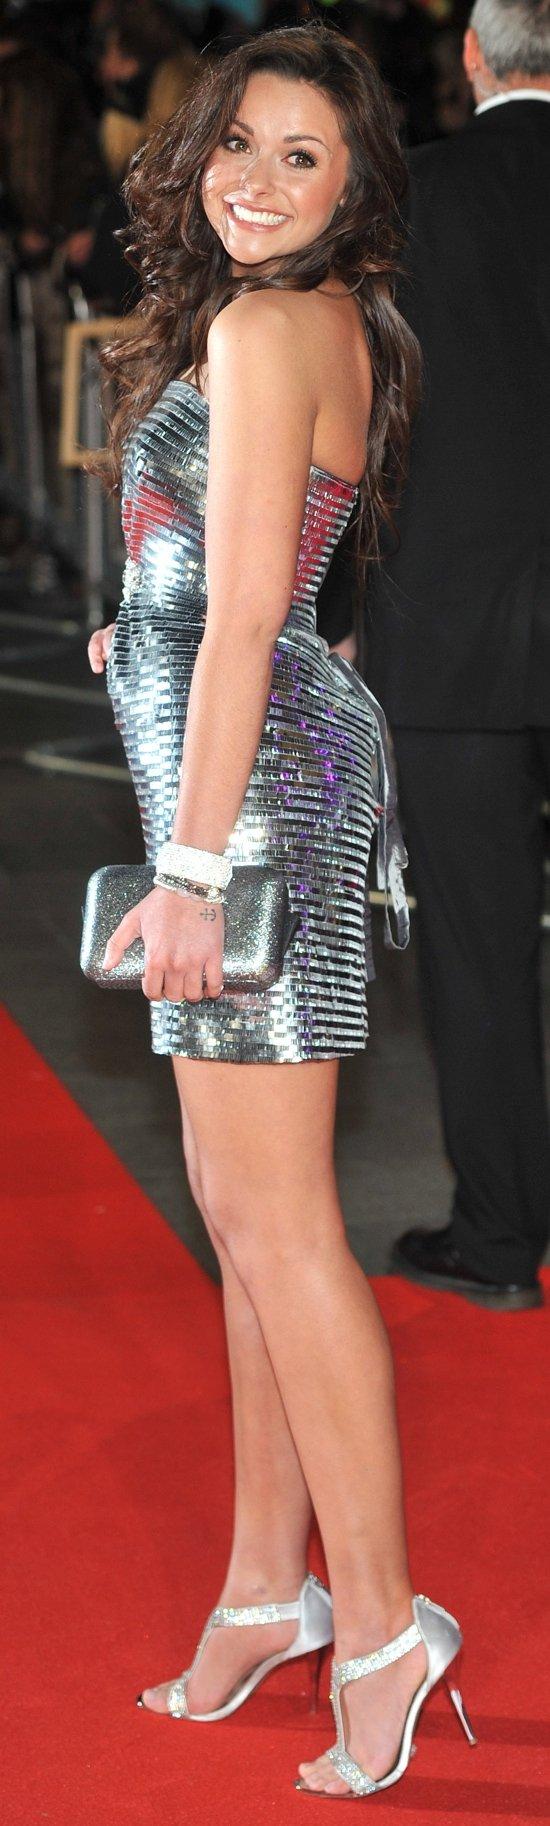 Kelsey-Beth Crossley showing off her legs in a strapless metallic dress